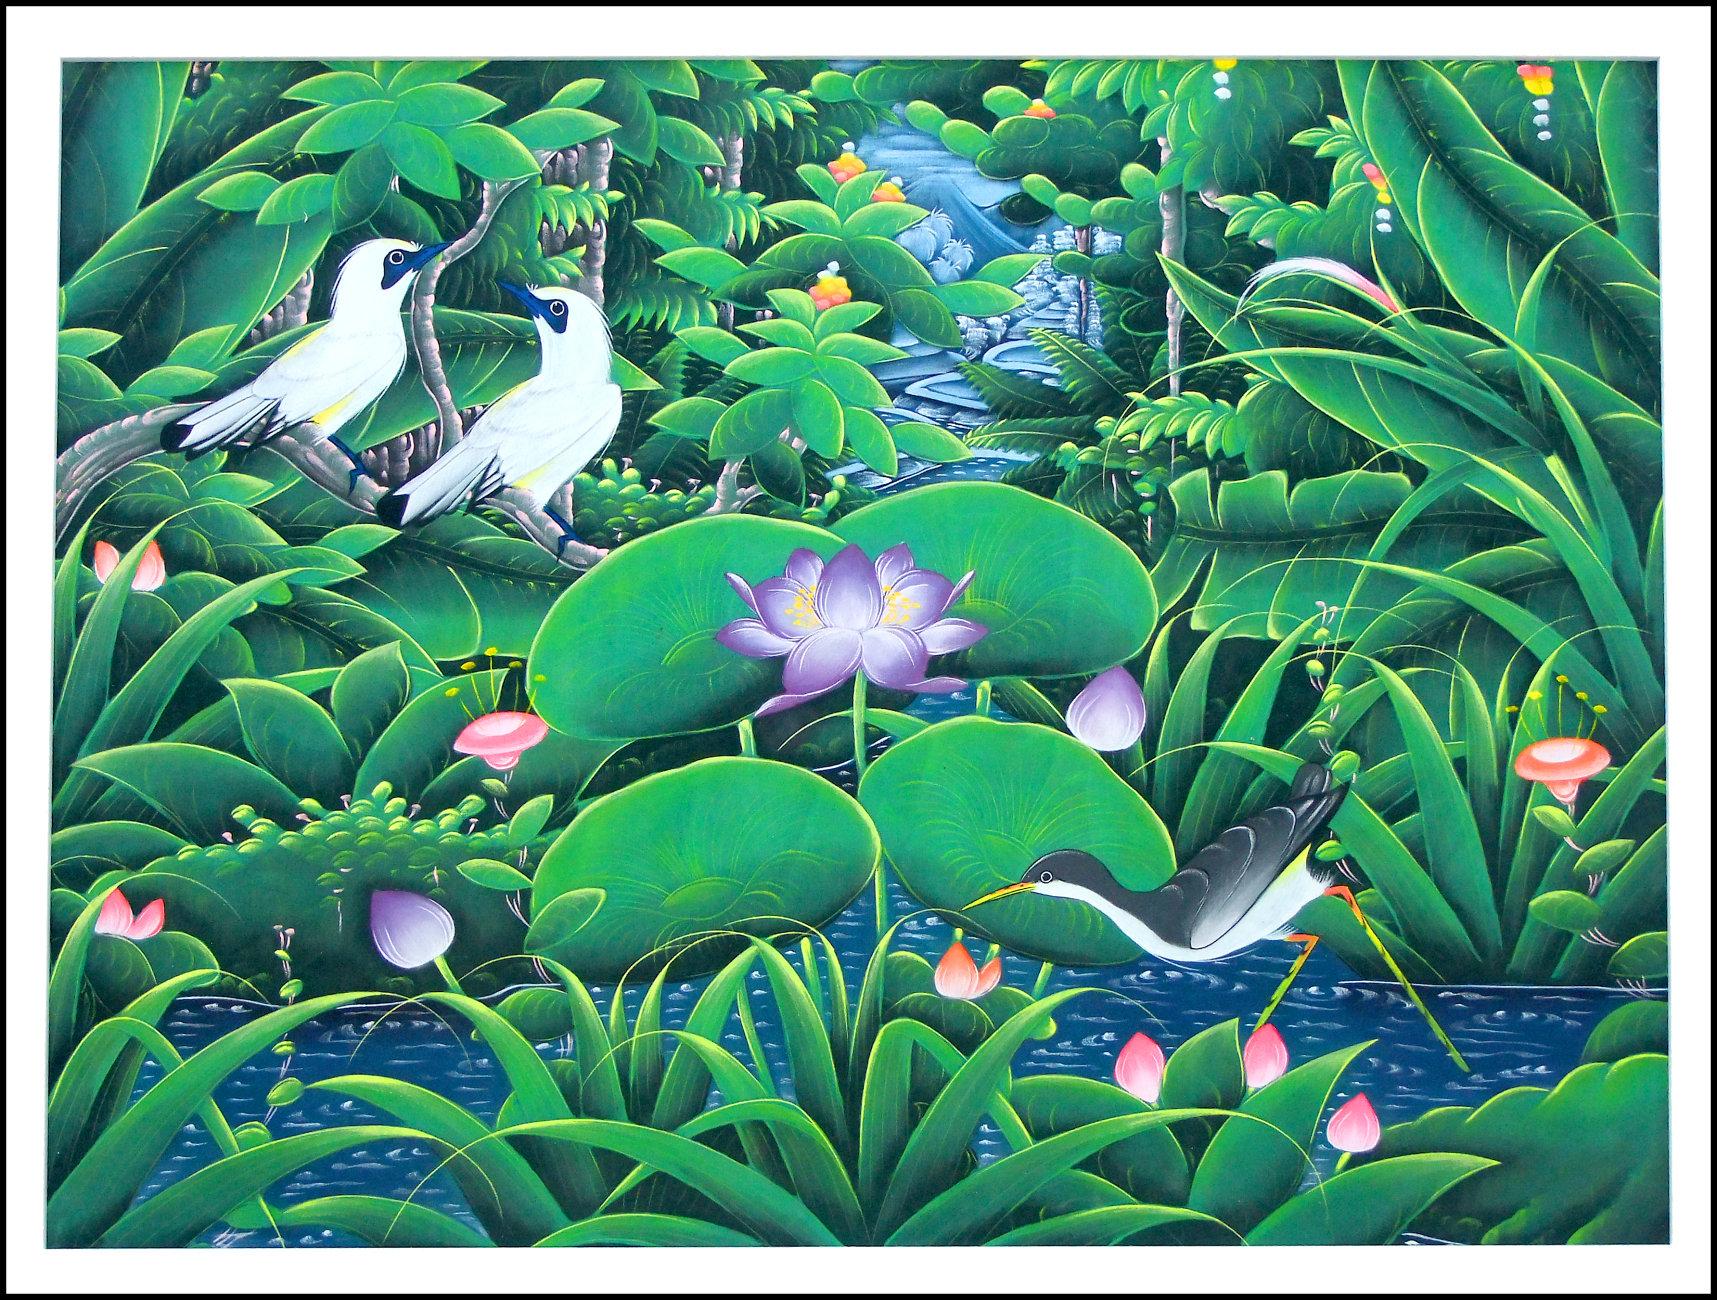 Artwork from Bali